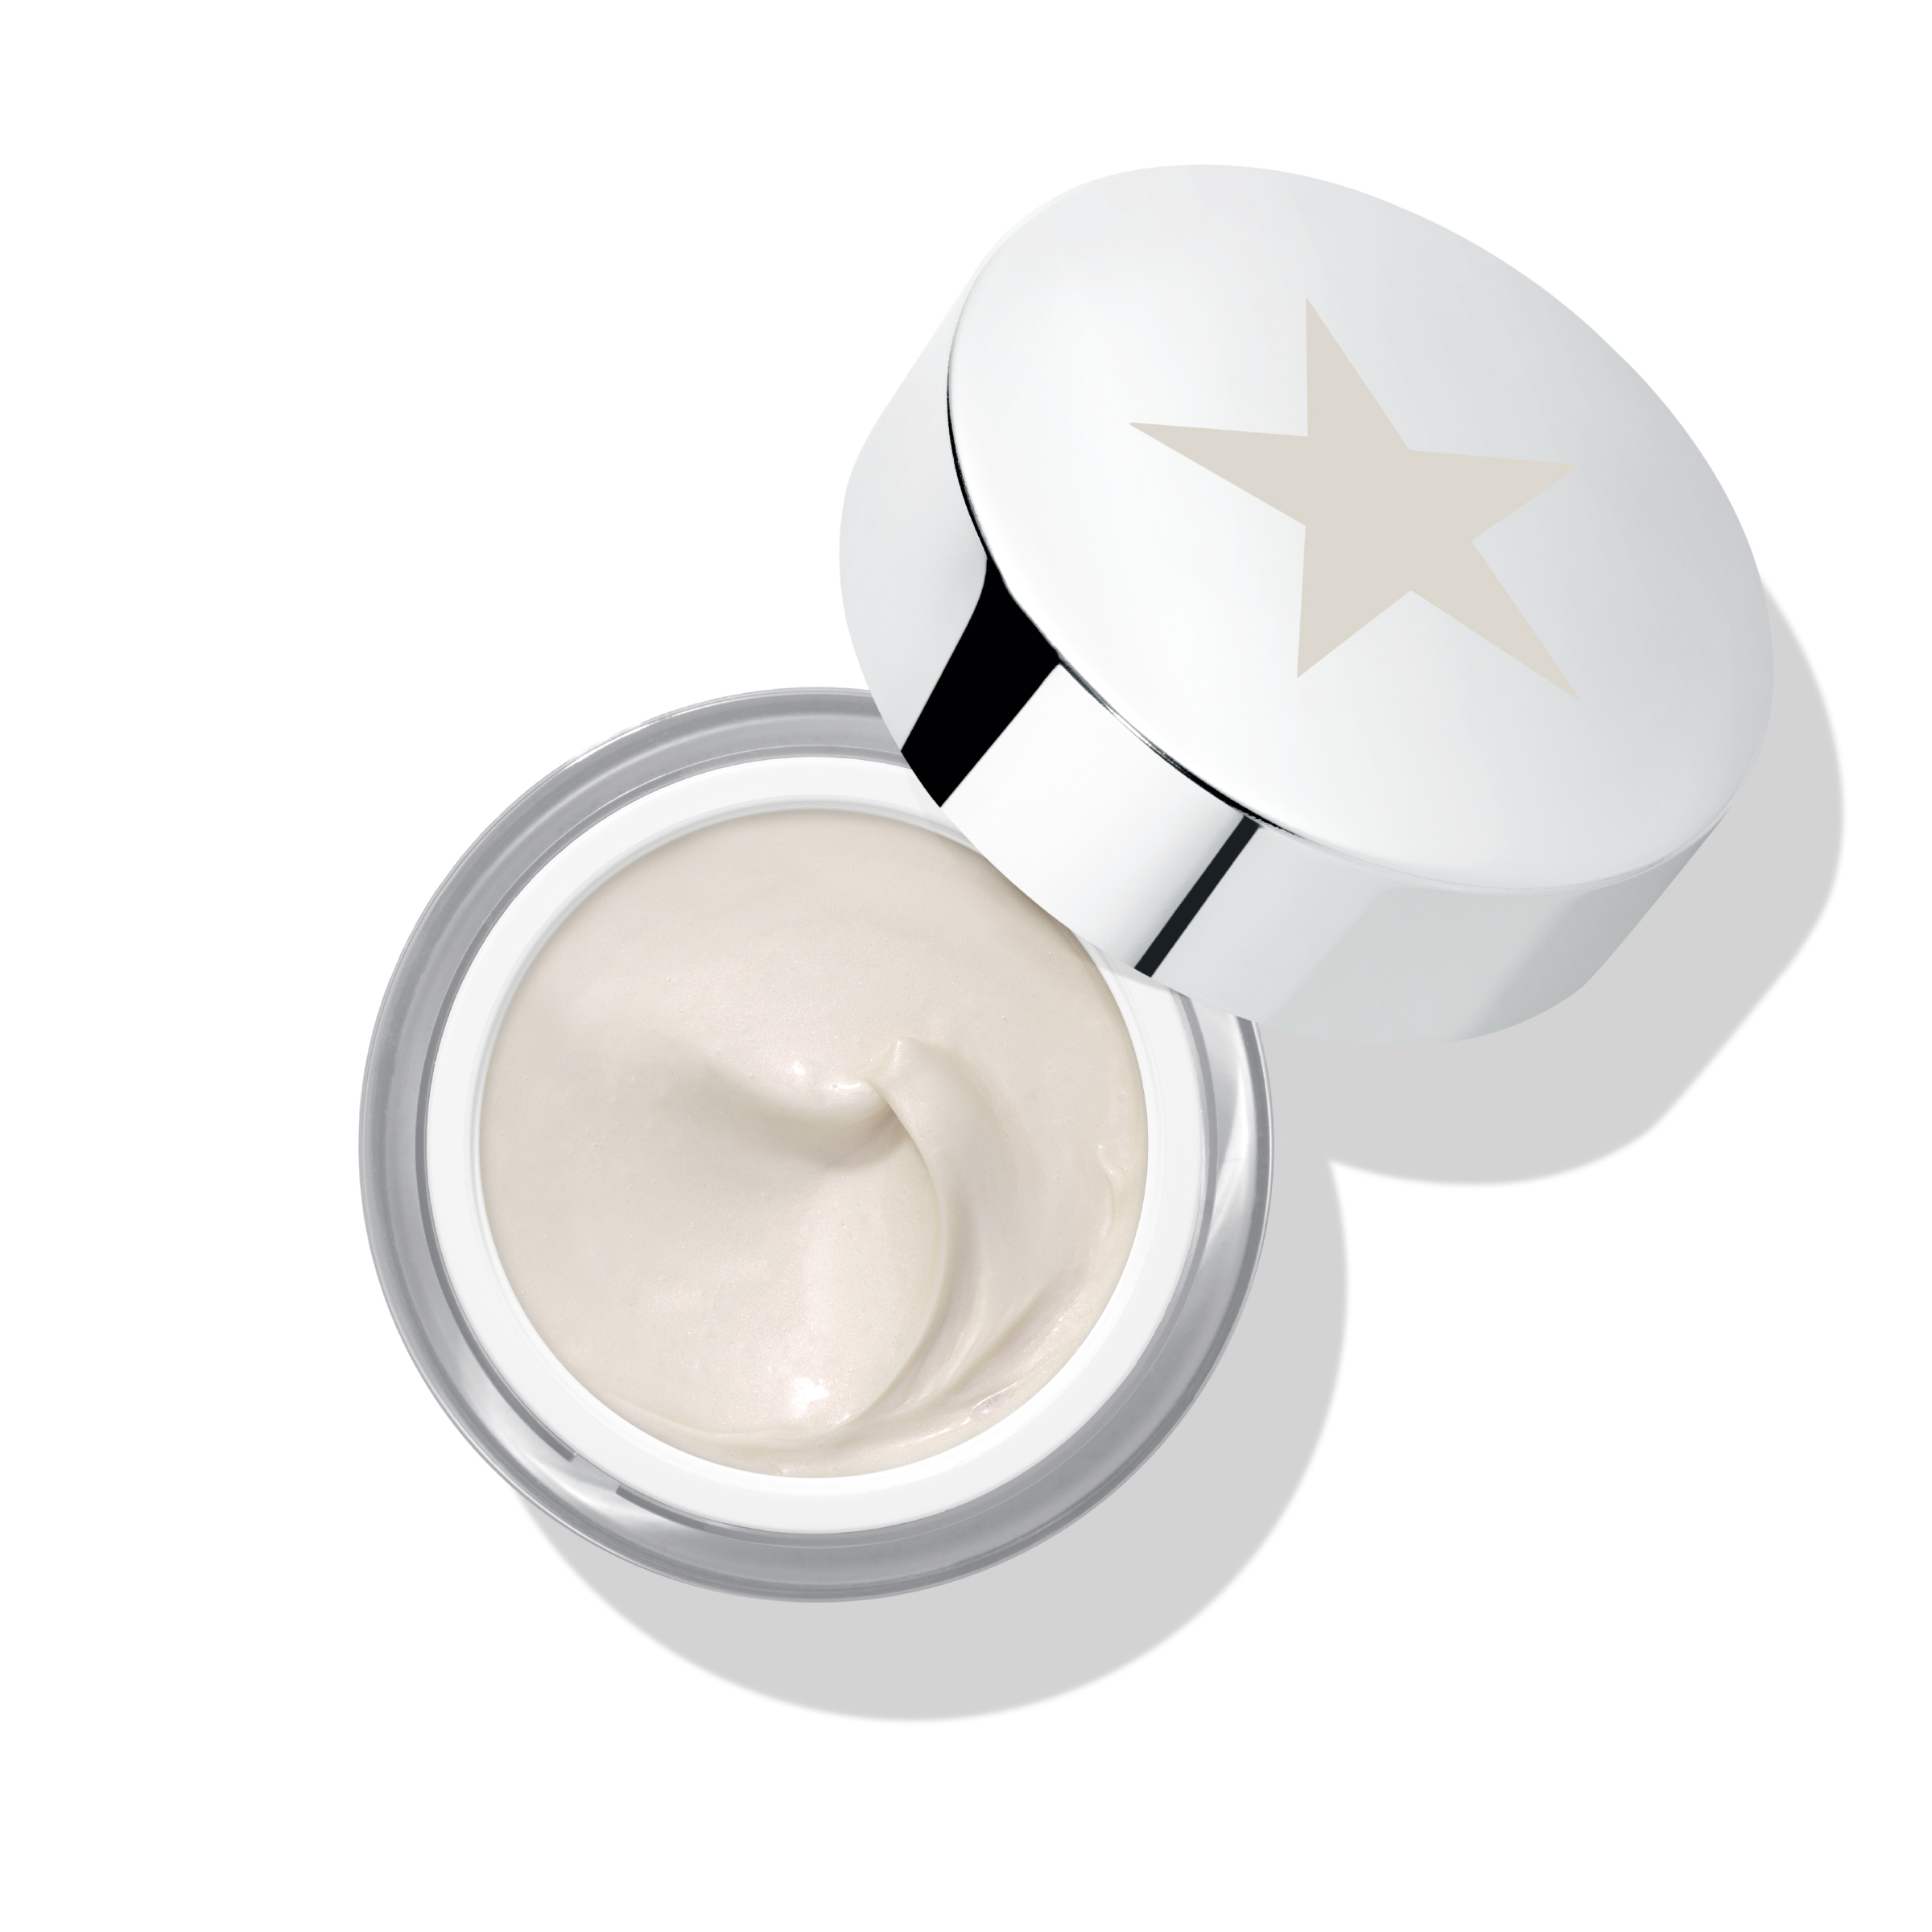 AKapustin_GG_GlowStarter_Pearl_Product_Brand_Primary.JPG